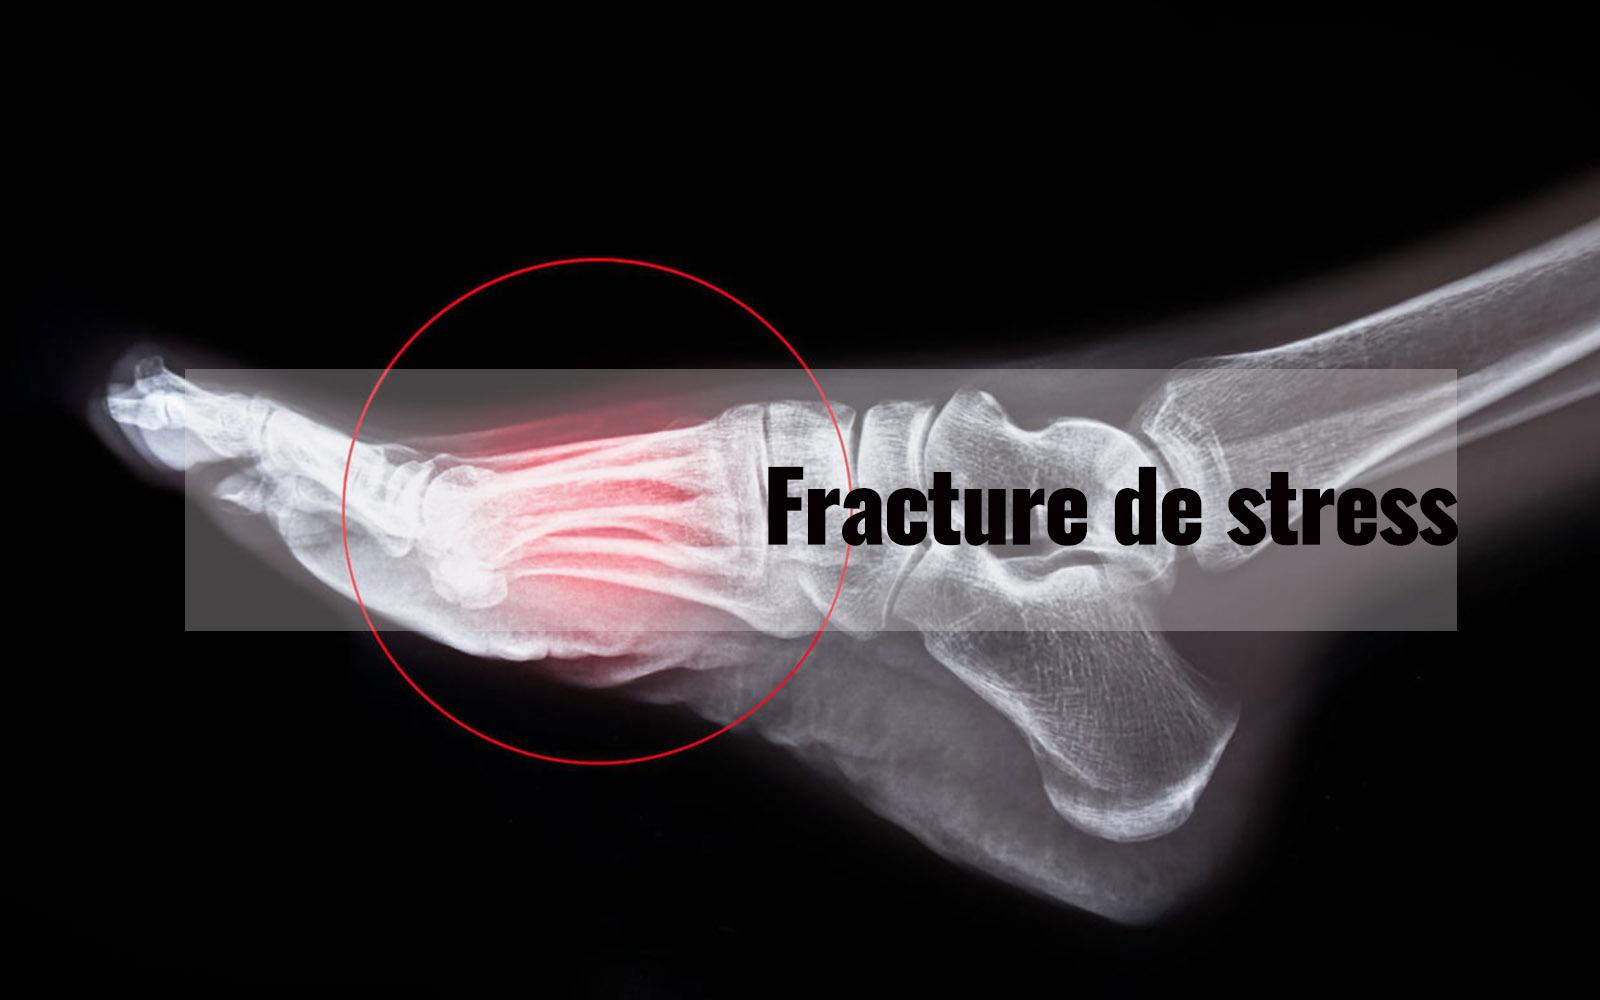 Fracture de stress